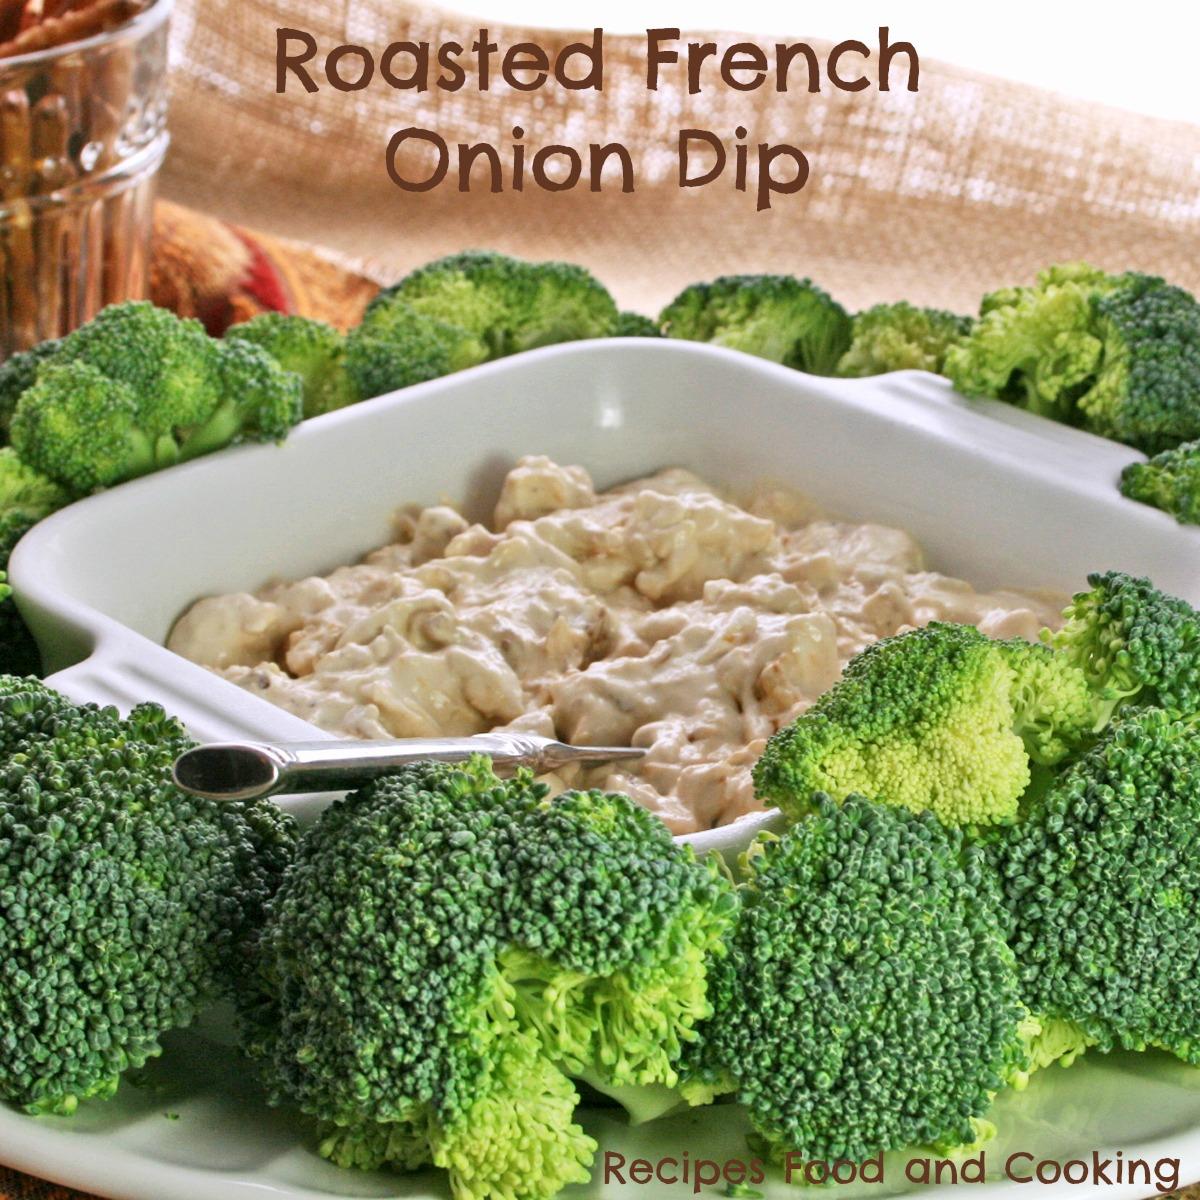 french-onion-dip-4f